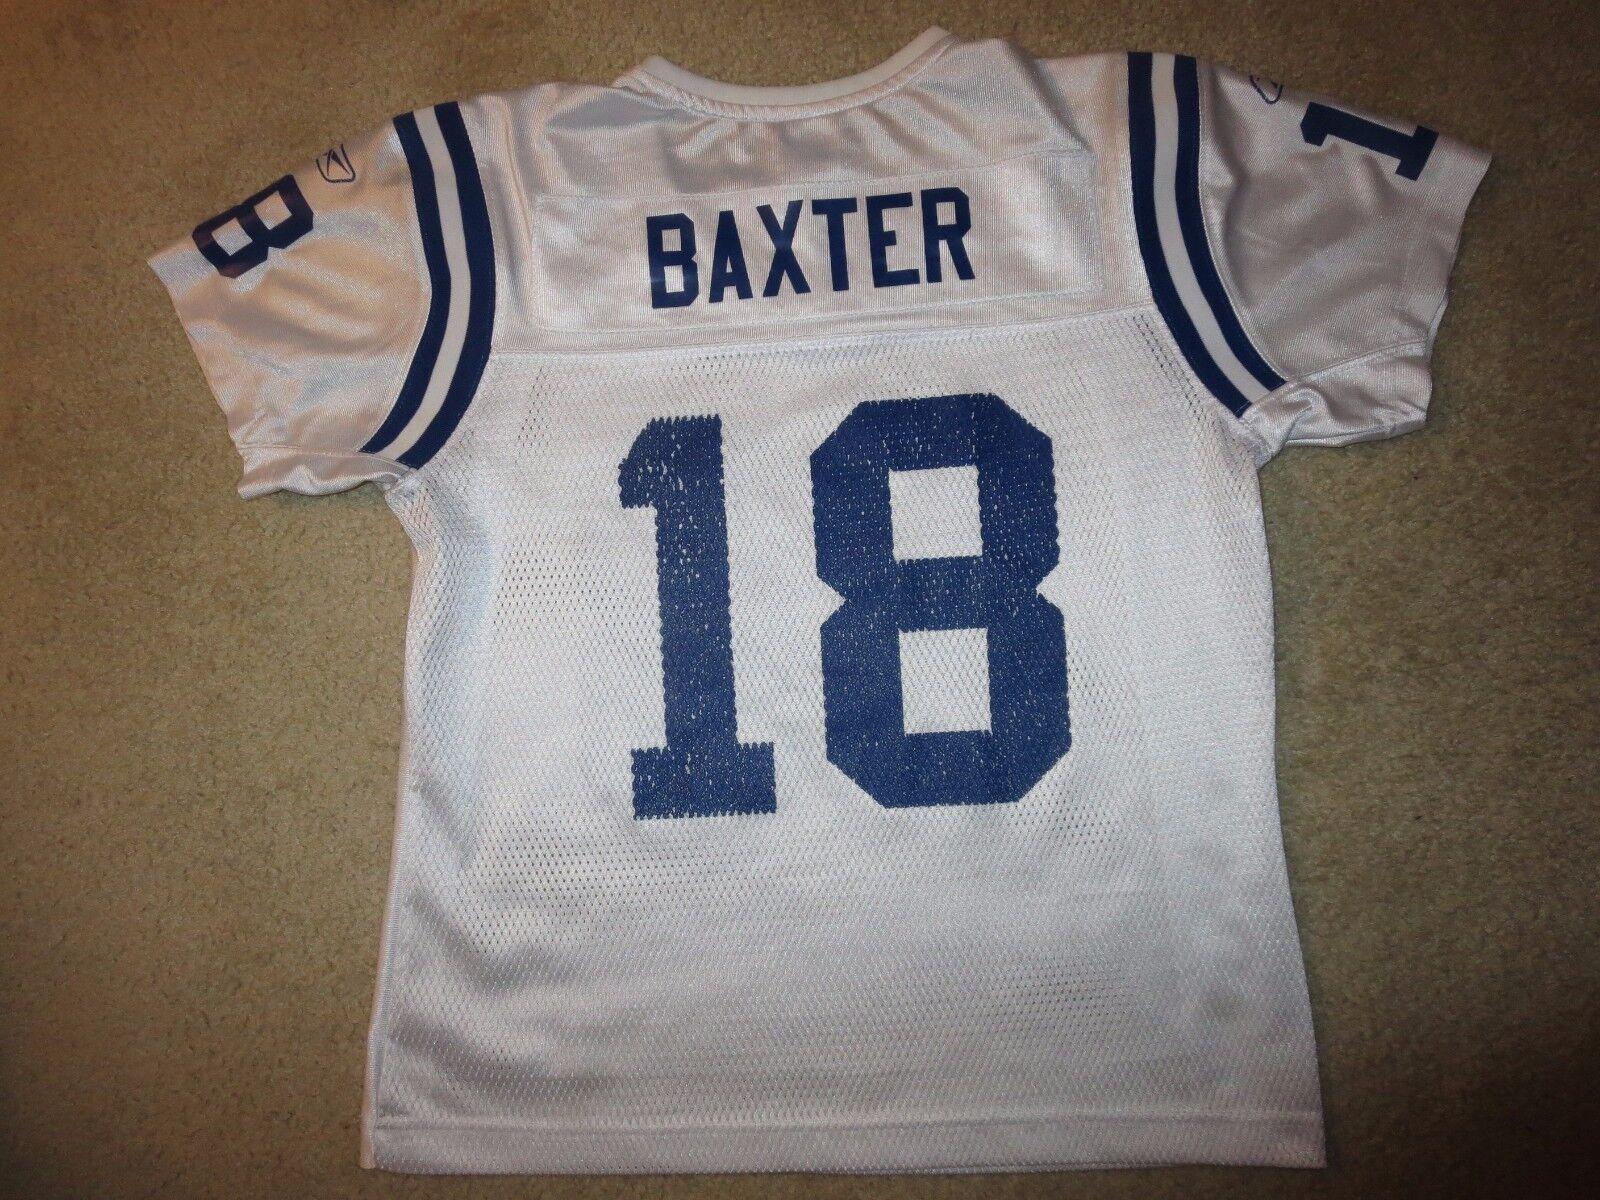 Indianapolis Colts  18 Super Bowl Reebok Baxter NFL Trikot Trikot Trikot Damen M Mittelgroß 5c4a08